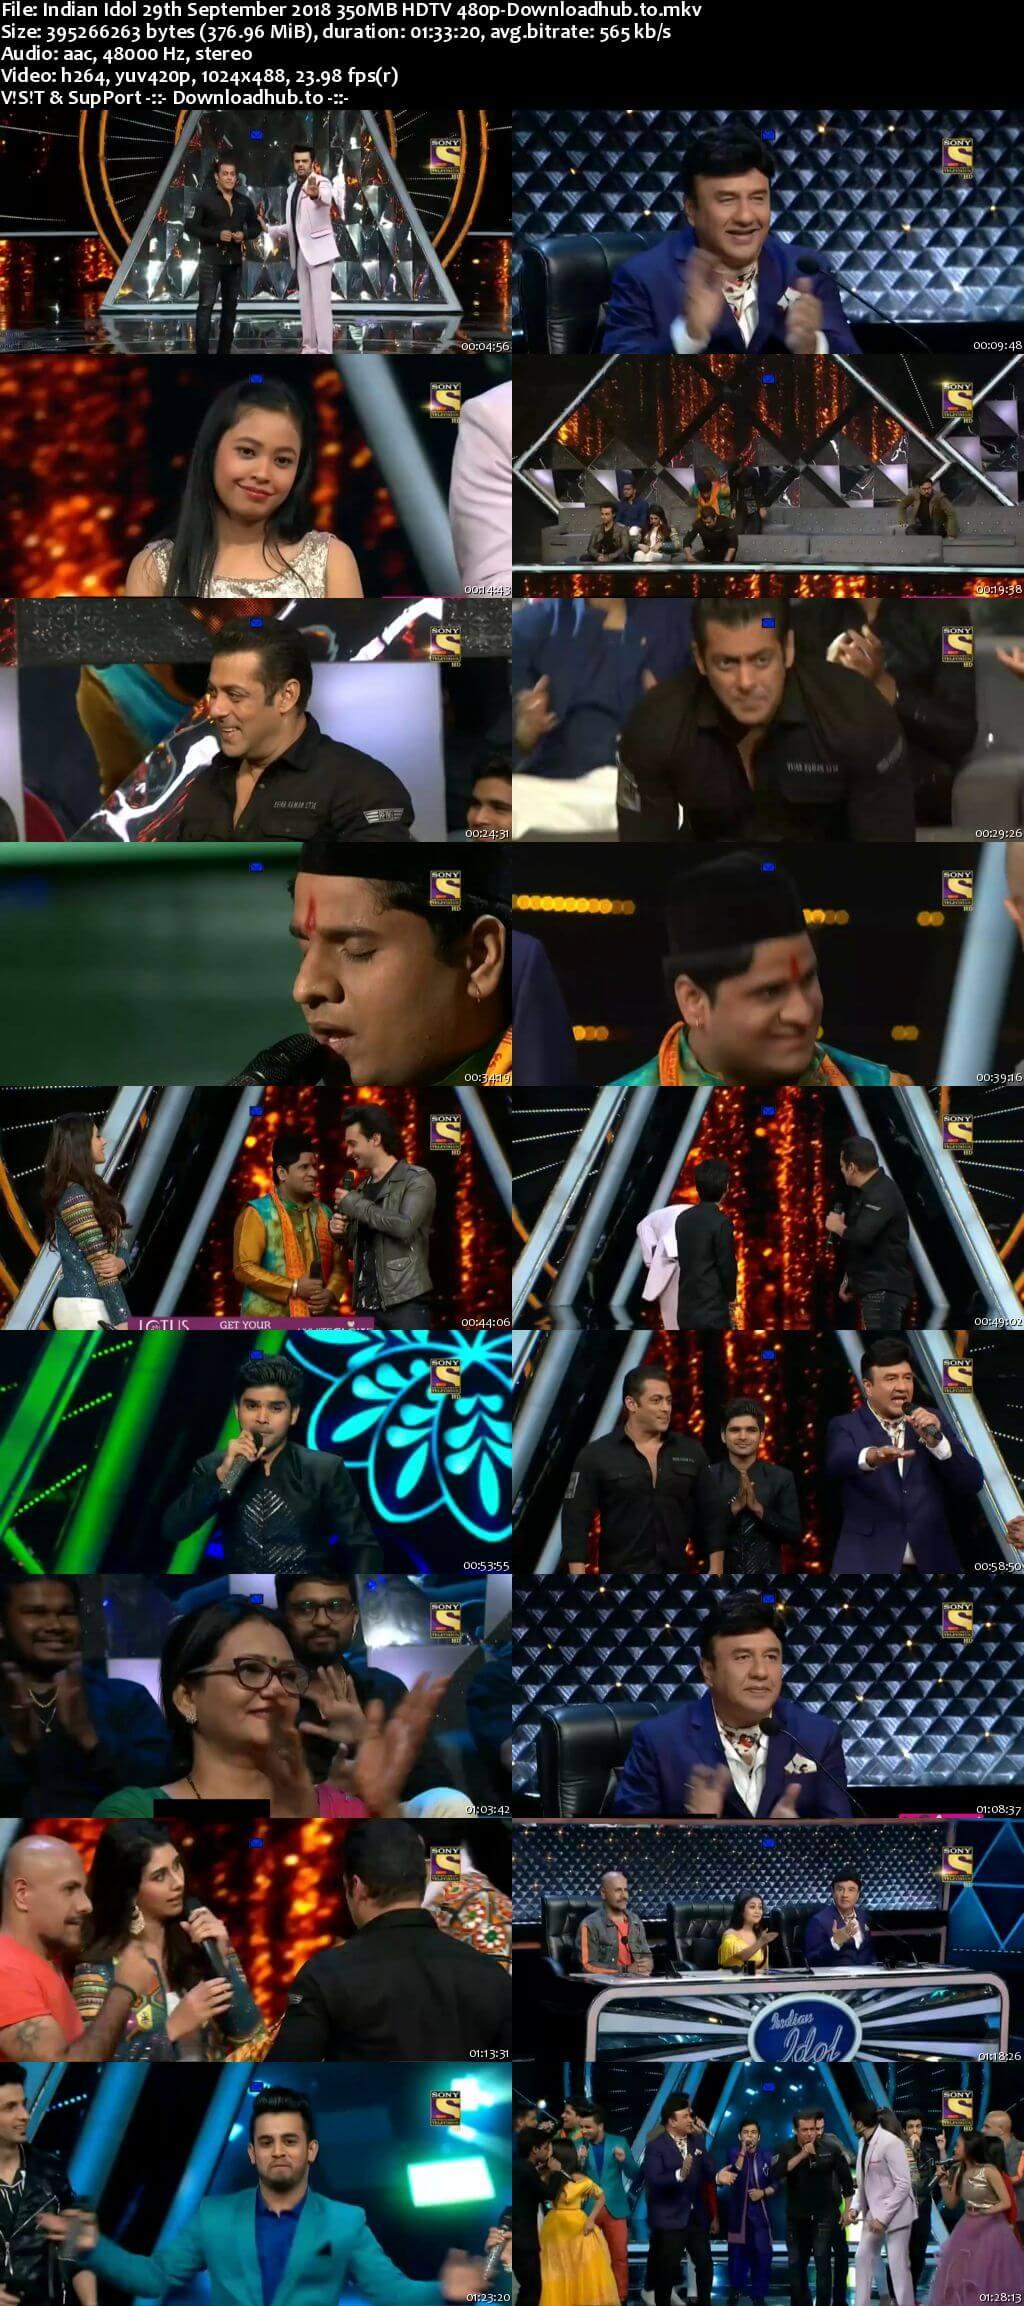 Indian Idol 29 September 2018 Episode 25 HDTV 480p